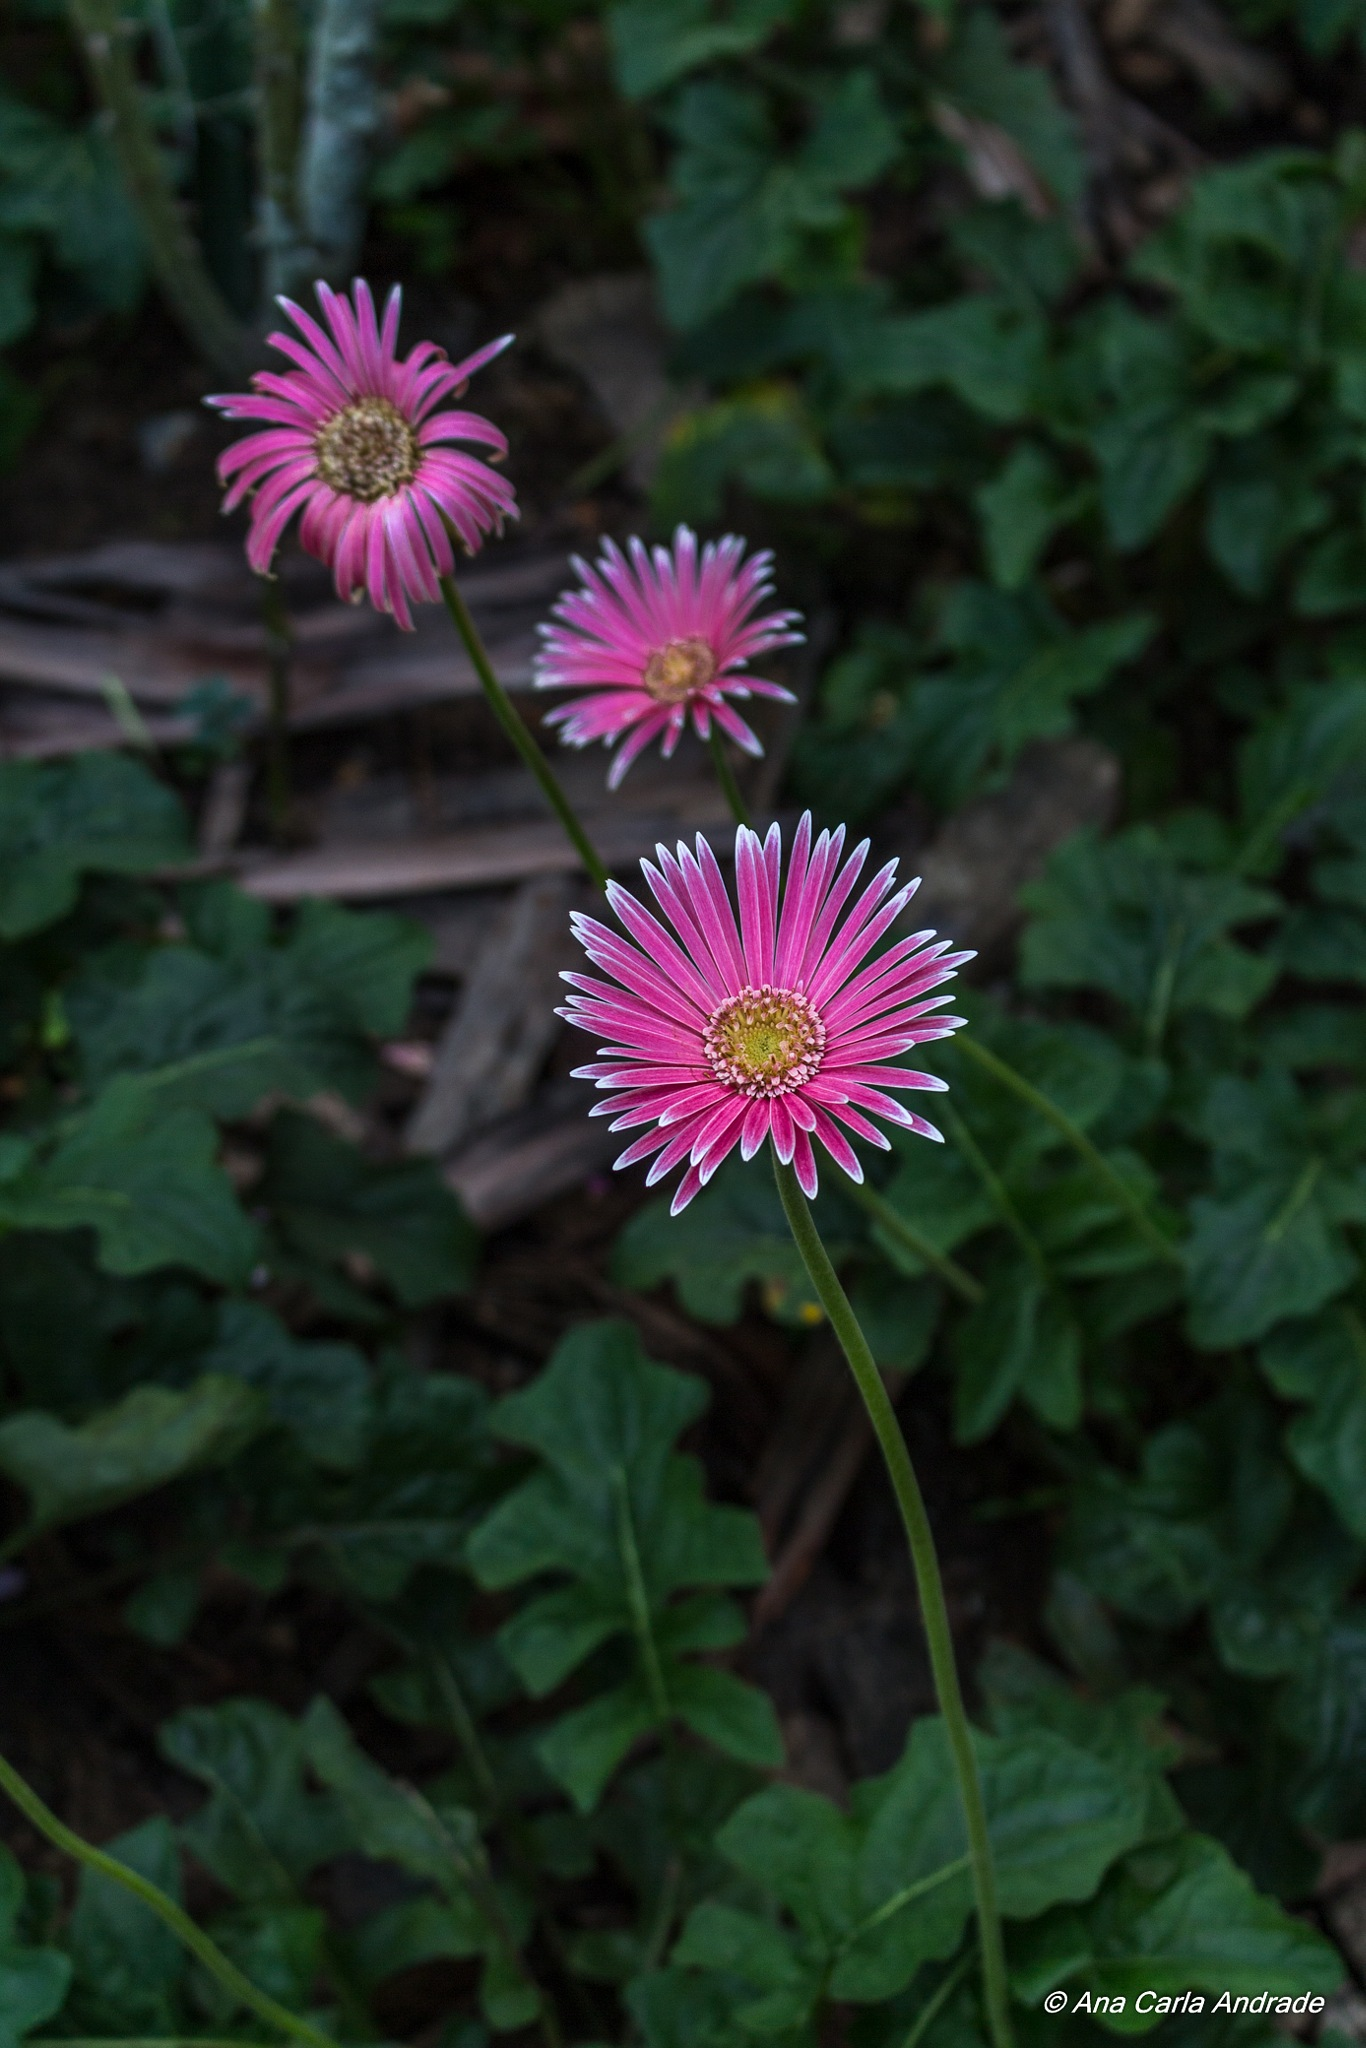 Flores para enfeitar a vida by Ana Carla Andrade